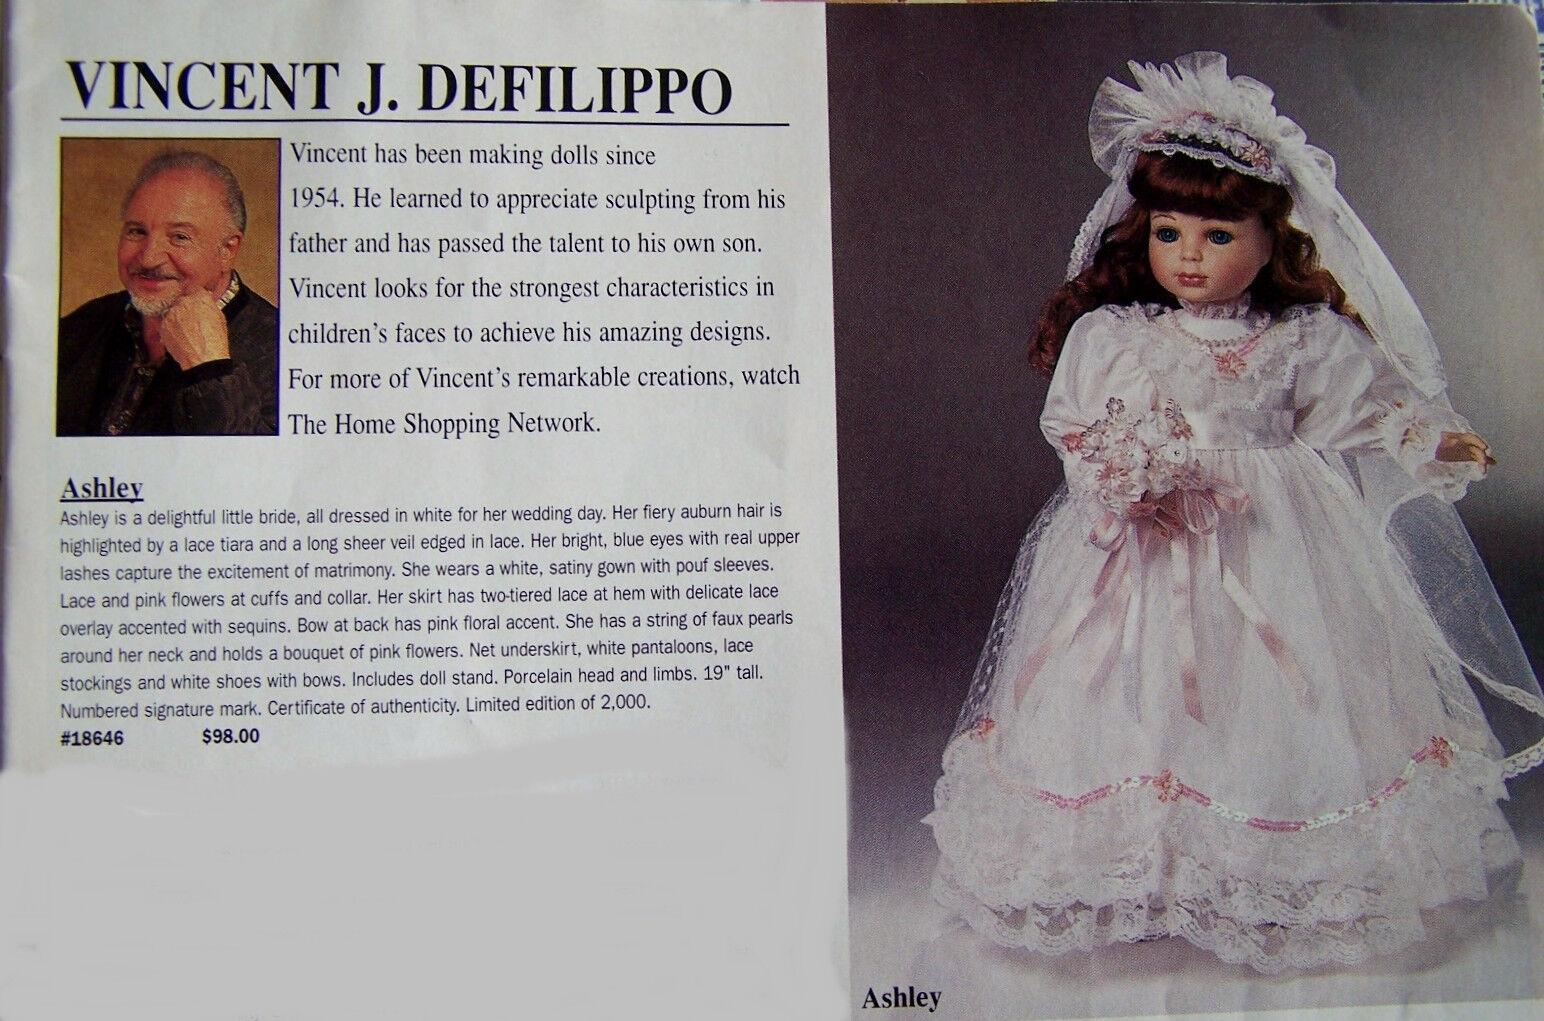 19   19 Design Guild ASHLEY DOLL BRIDE by Vincent J. Fefilippo  LE 3 2000 NRFB 394f09